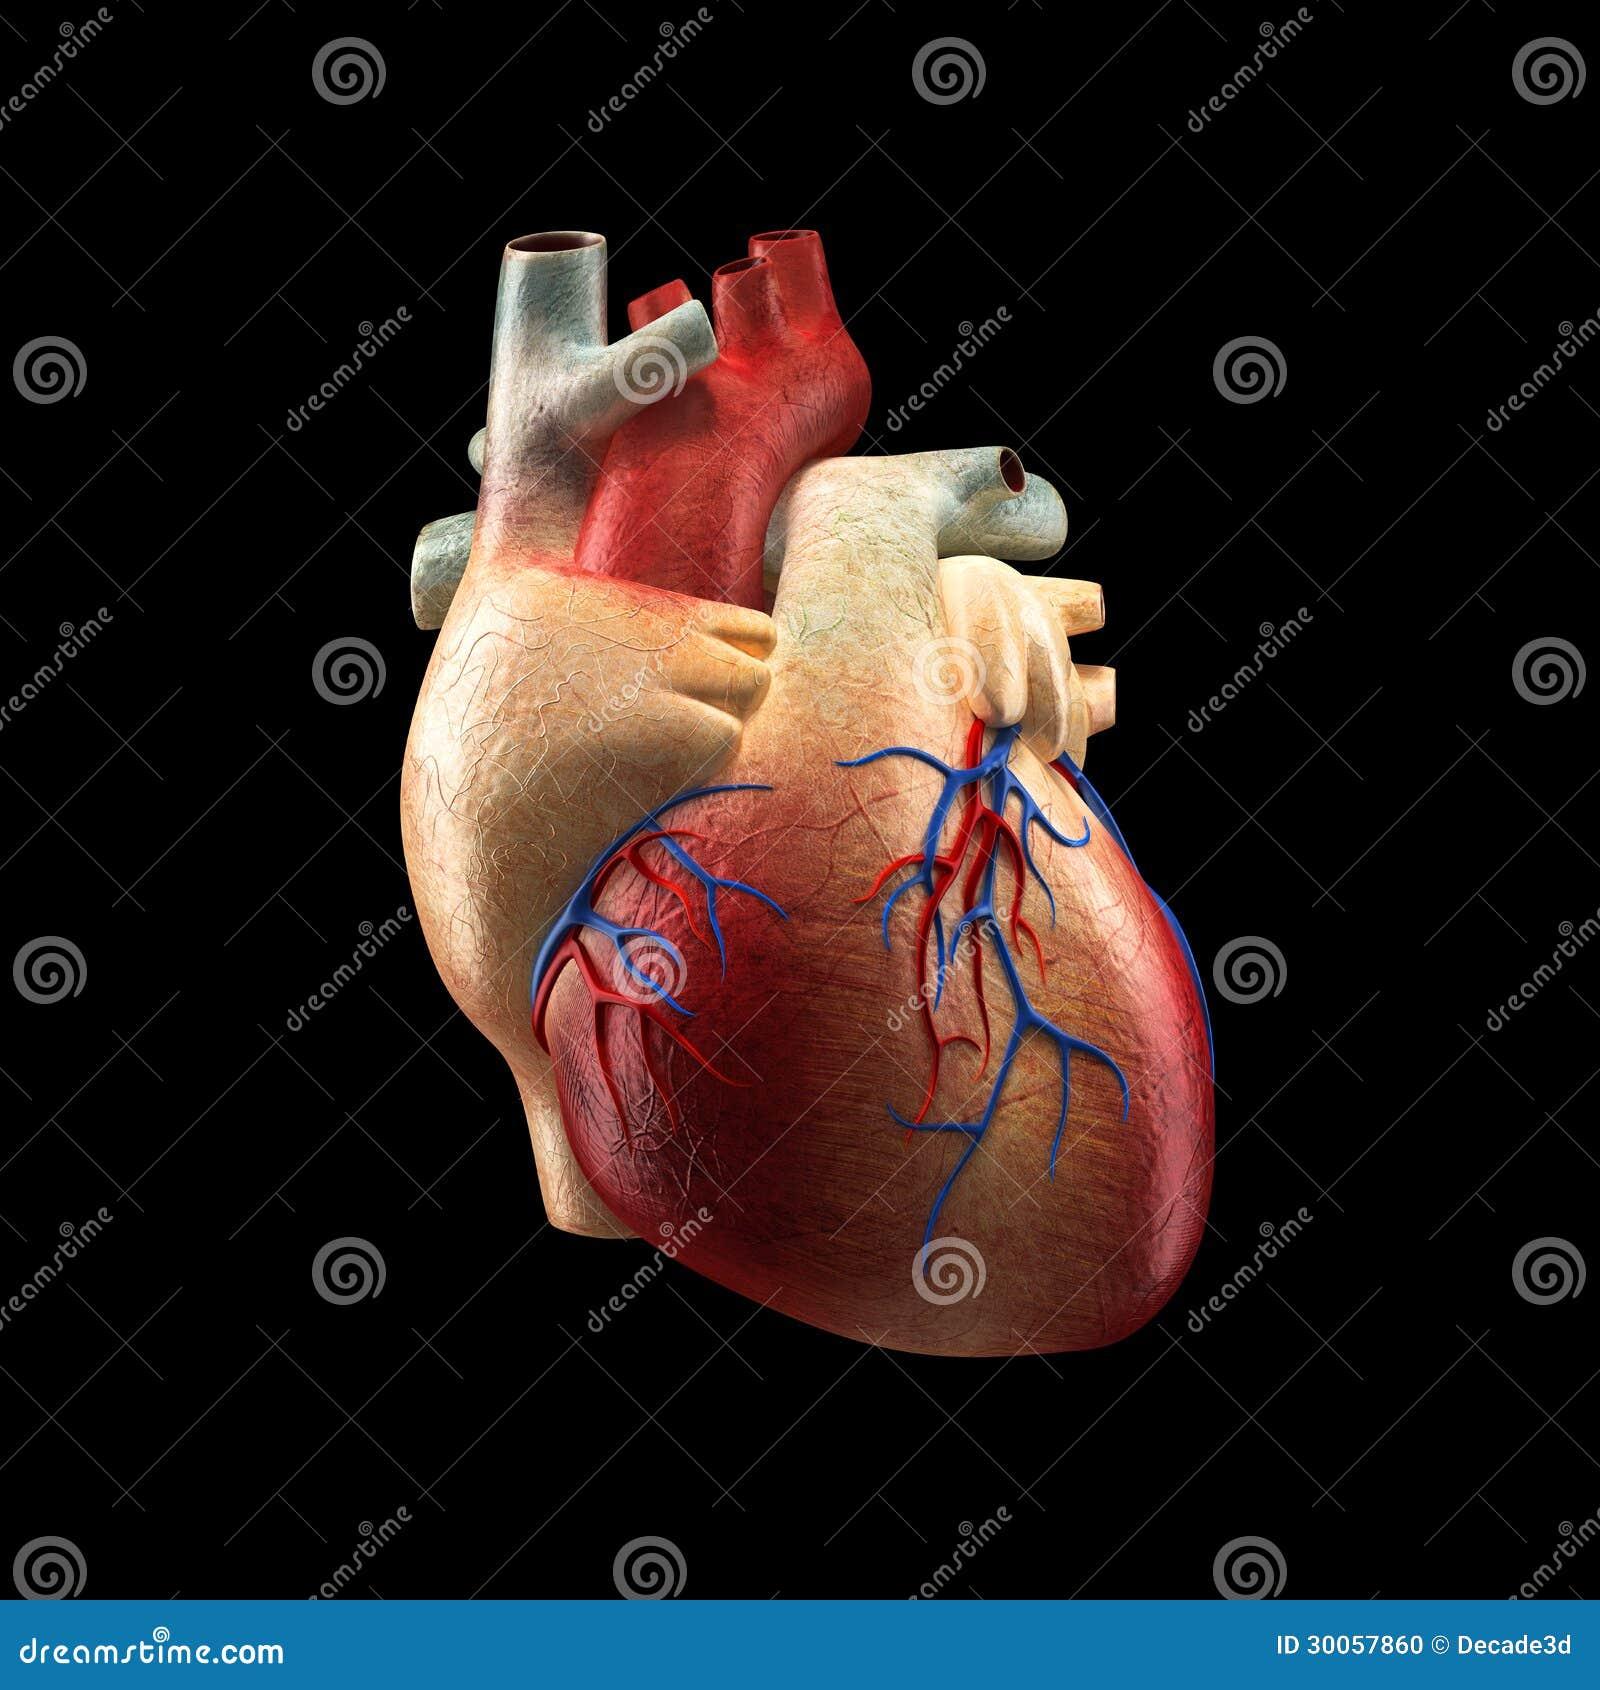 Real Heart Isolated On Black Human Anatomy Model Stock